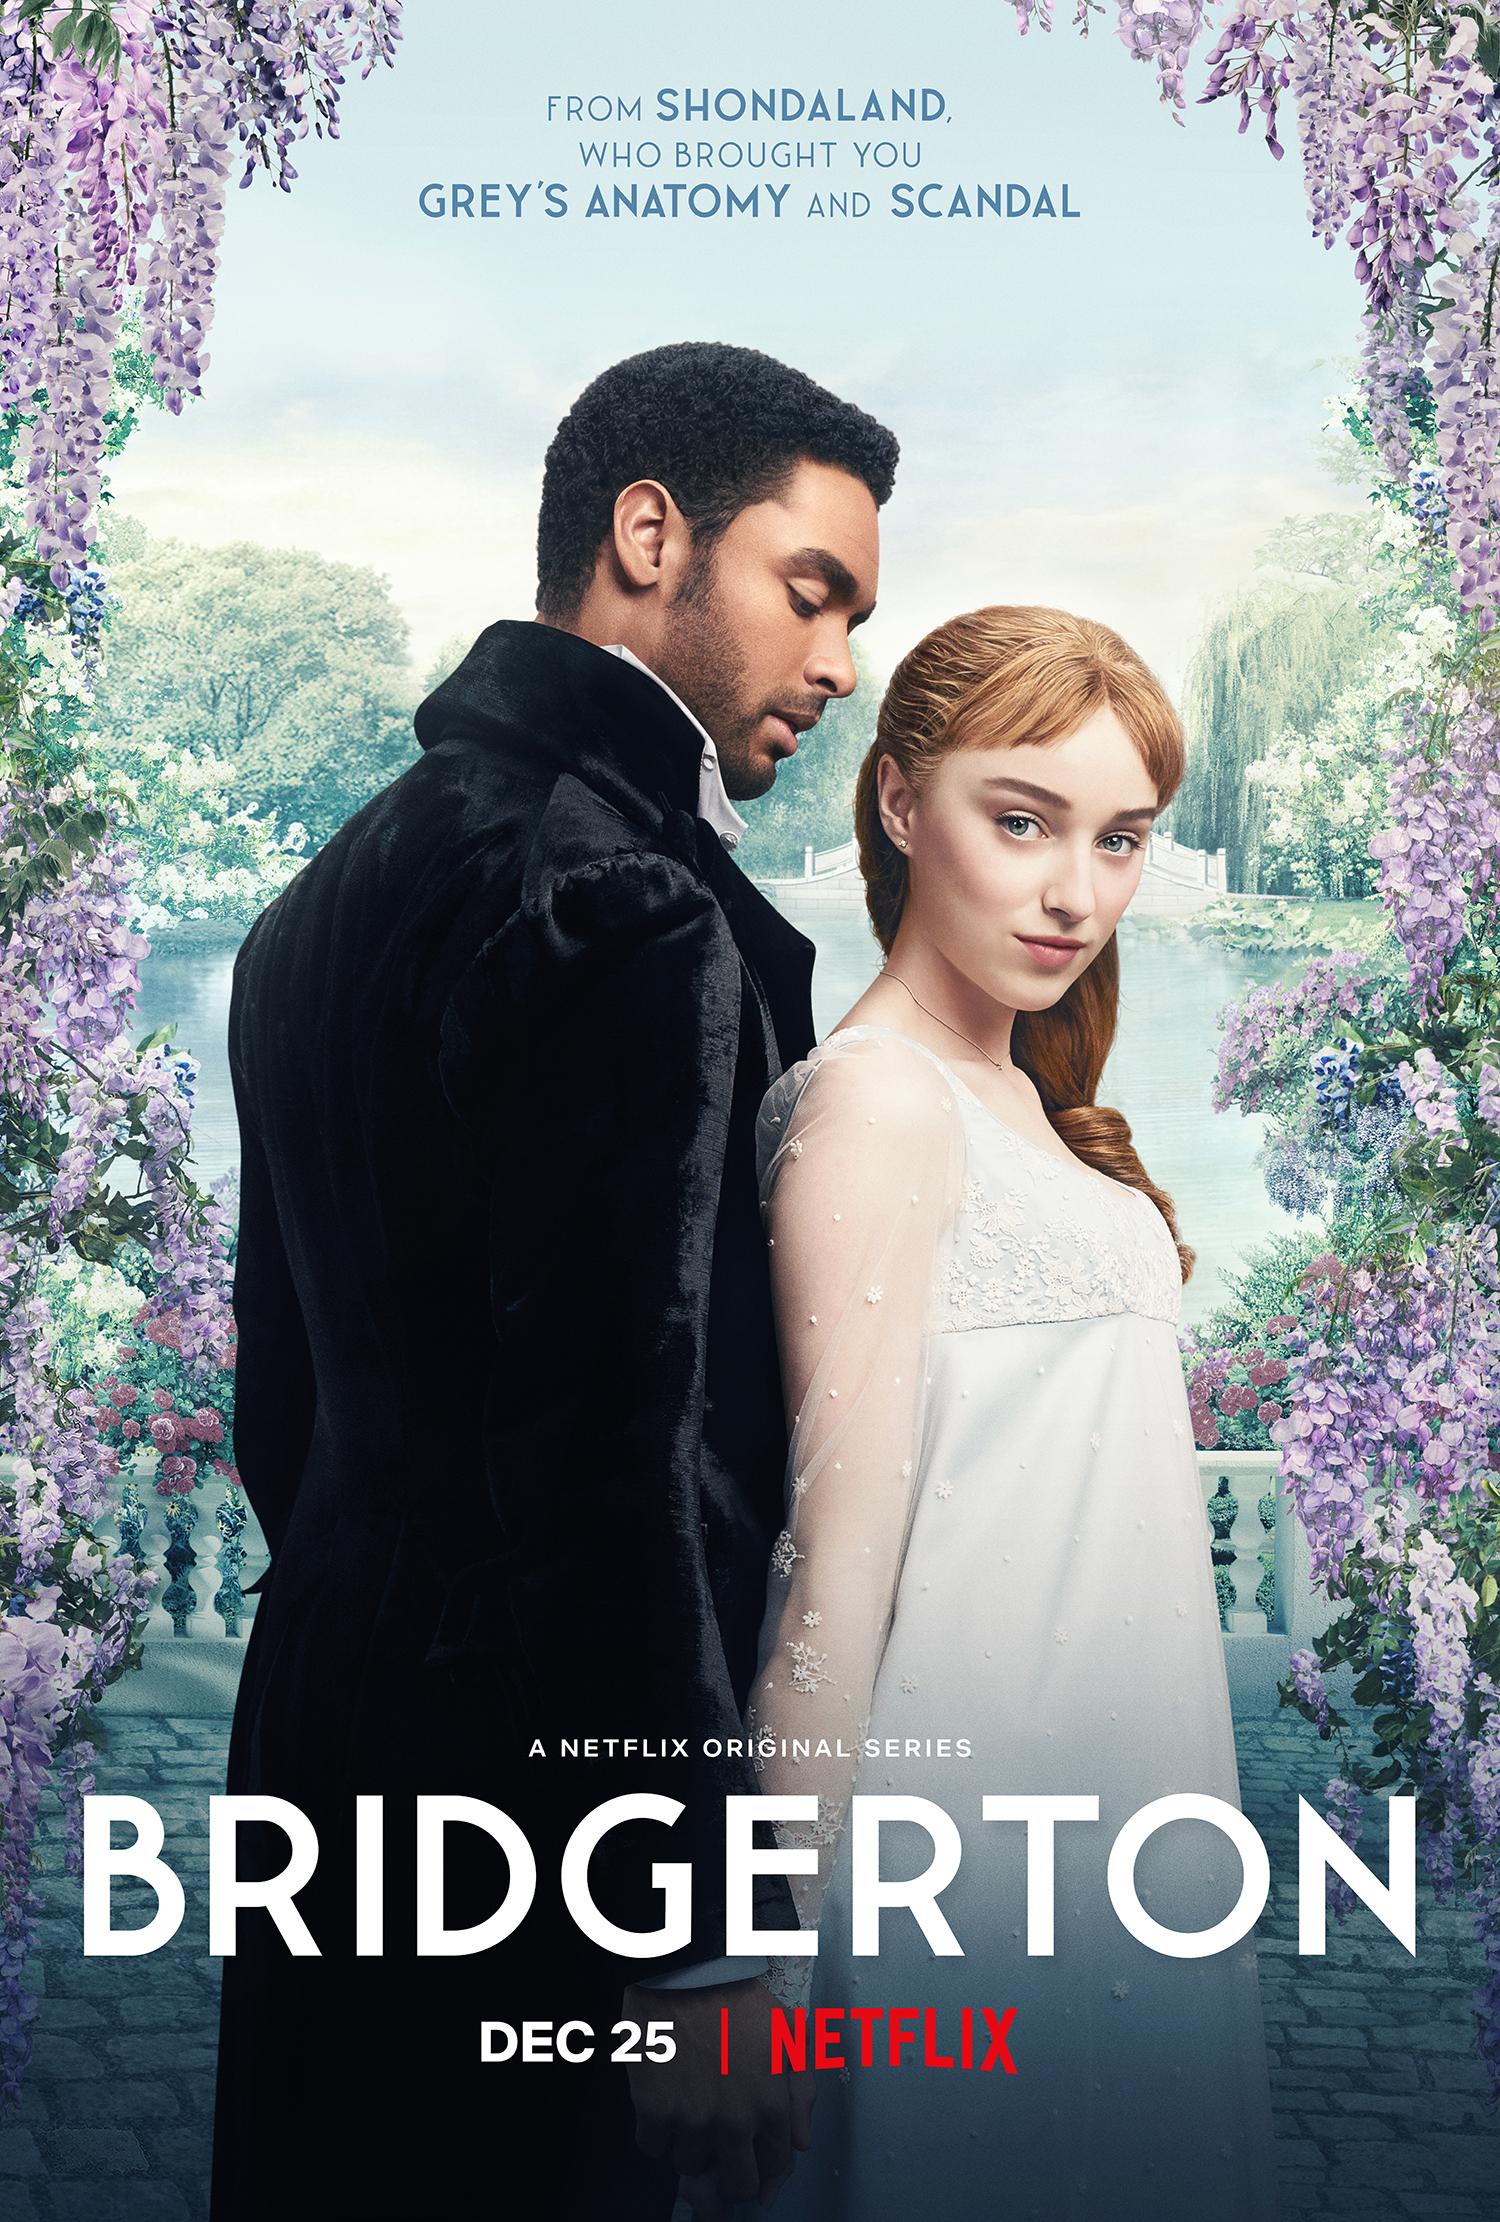 Netflix Orders Seasons 3 & 4 Of Hit Drama Series Bridgerton